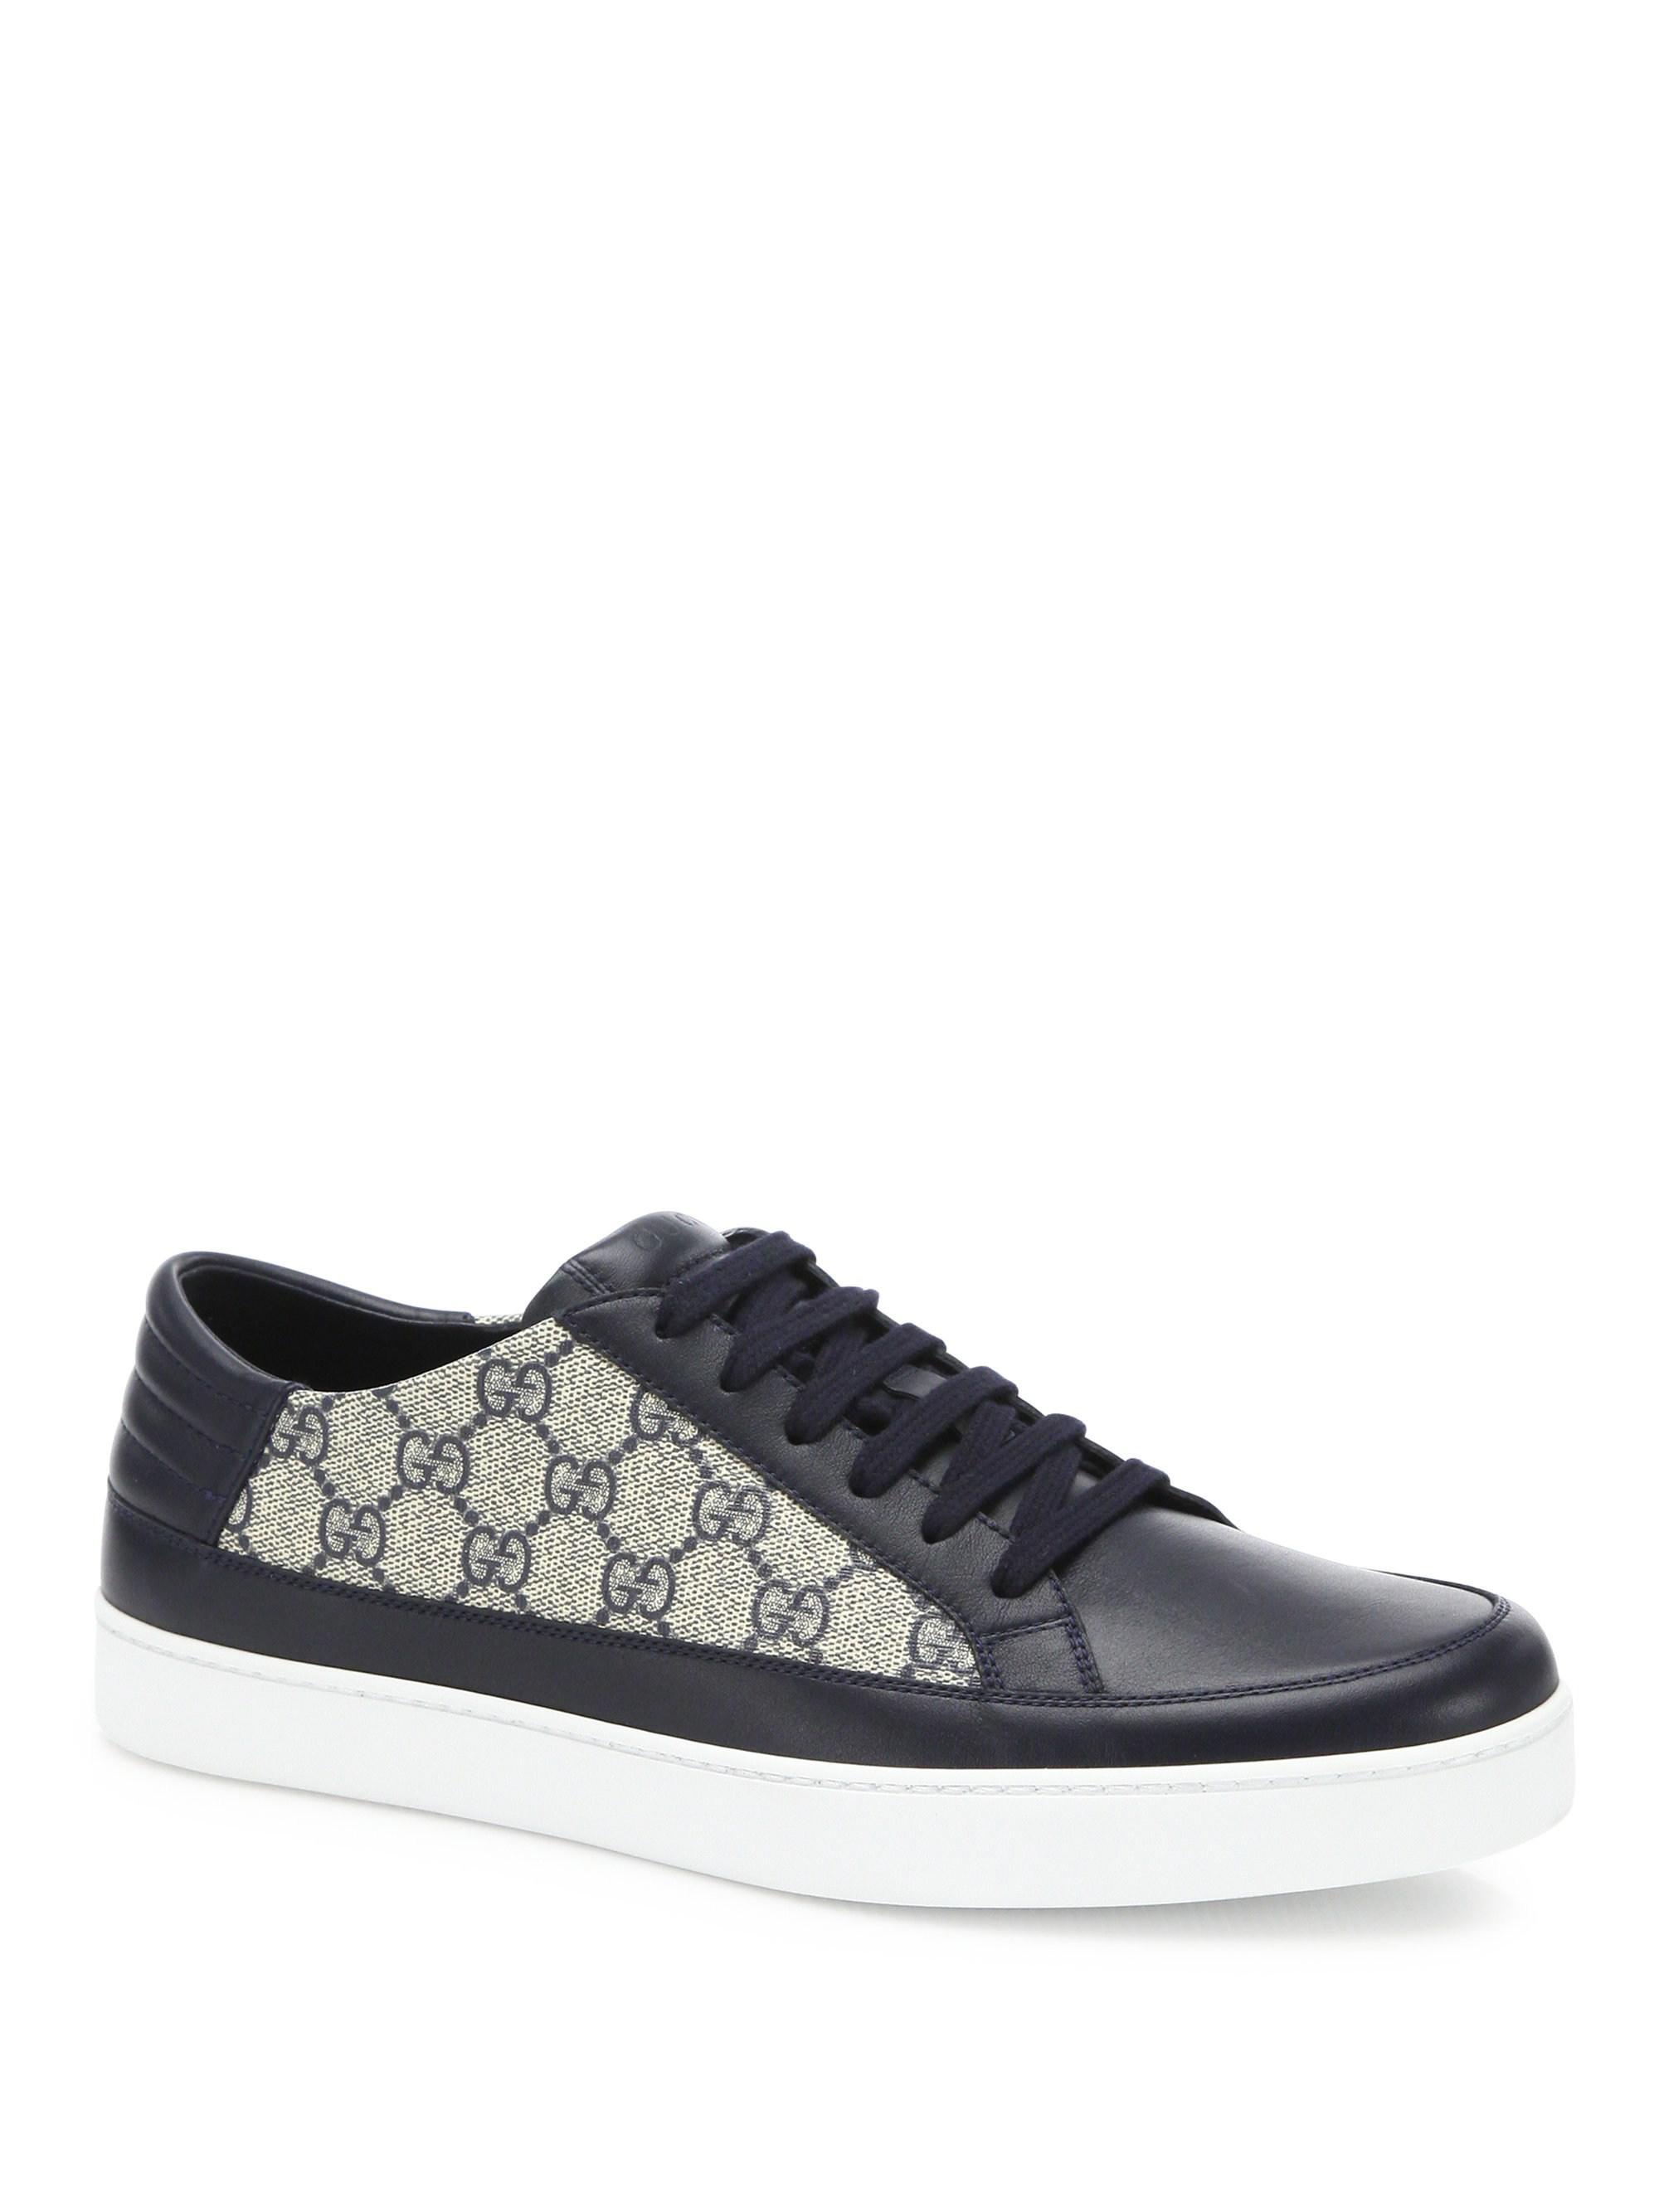 8a5335182f2 Gucci. Gray Men s GG Supreme Sneaker - Black Graphite - Size 6.5 Uk (7.5  Us).  765 From Saks Fifth Avenue